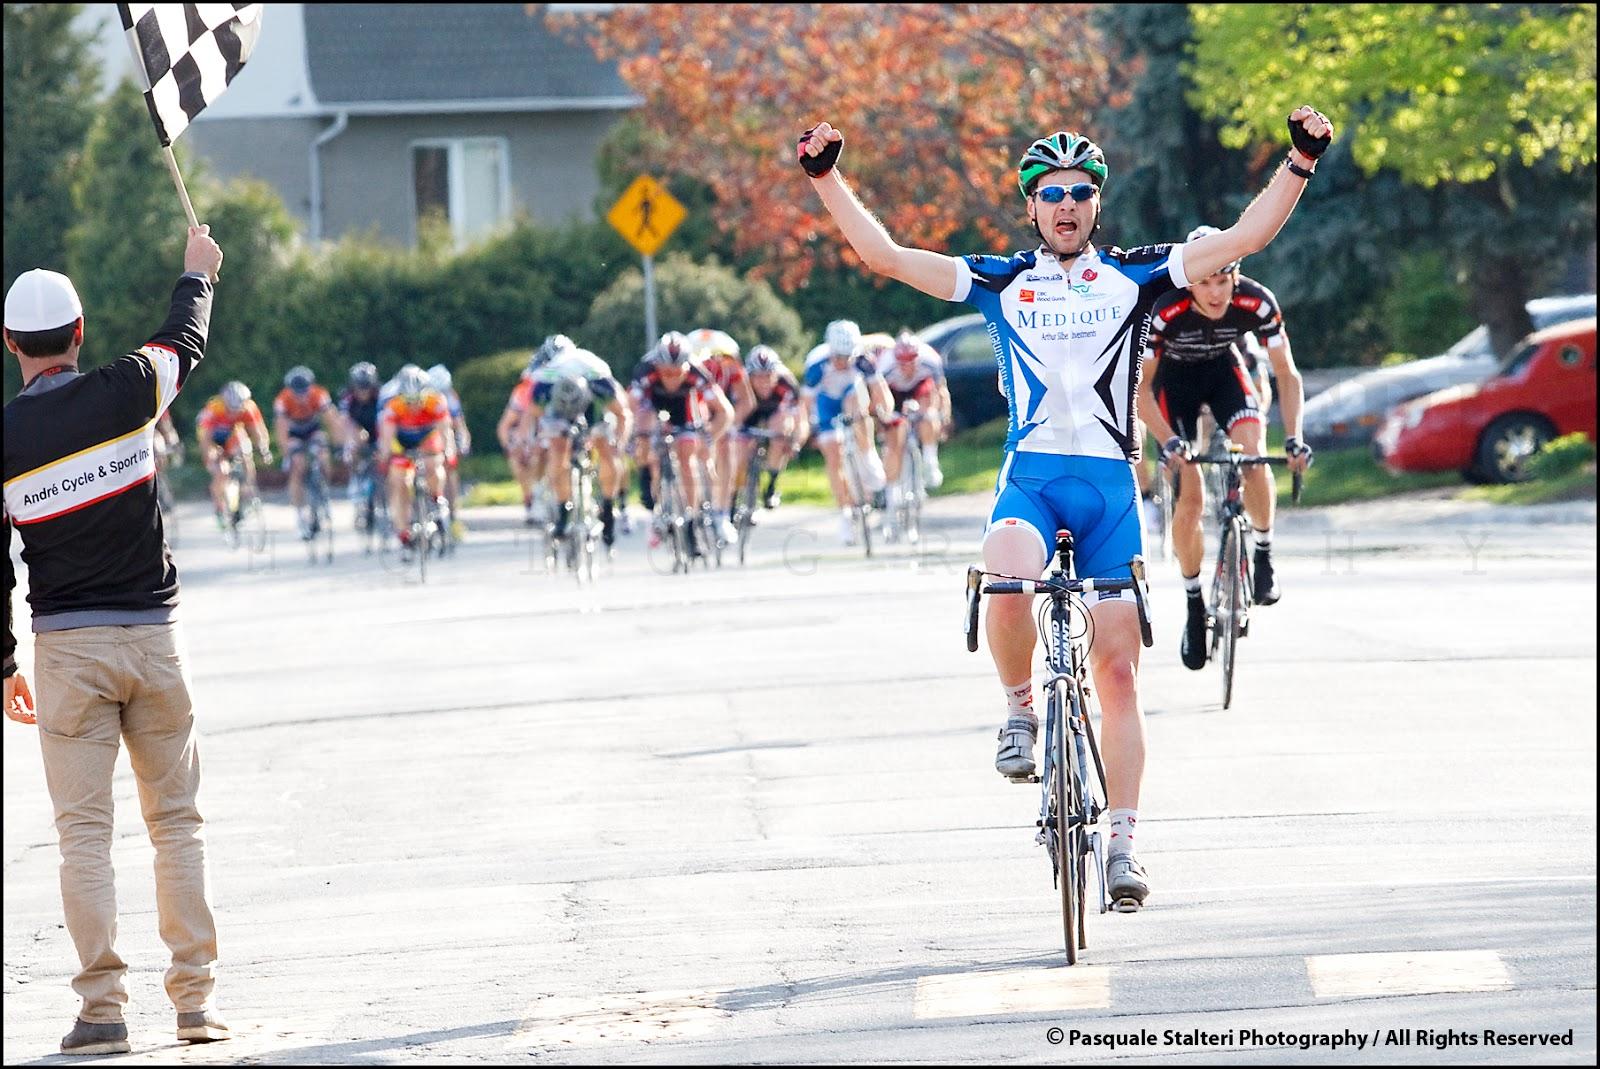 http://4.bp.blogspot.com/-xY2bgOTGdHc/T6cFRT4OSnI/AAAAAAAAN8Y/nh17ALDGnS8/s1600/Miroir+du+Cyclisme_Nicolas+Ammerlaan_Pasquale+Stalteri_GP+de+Brossard_PAS3334.jpg